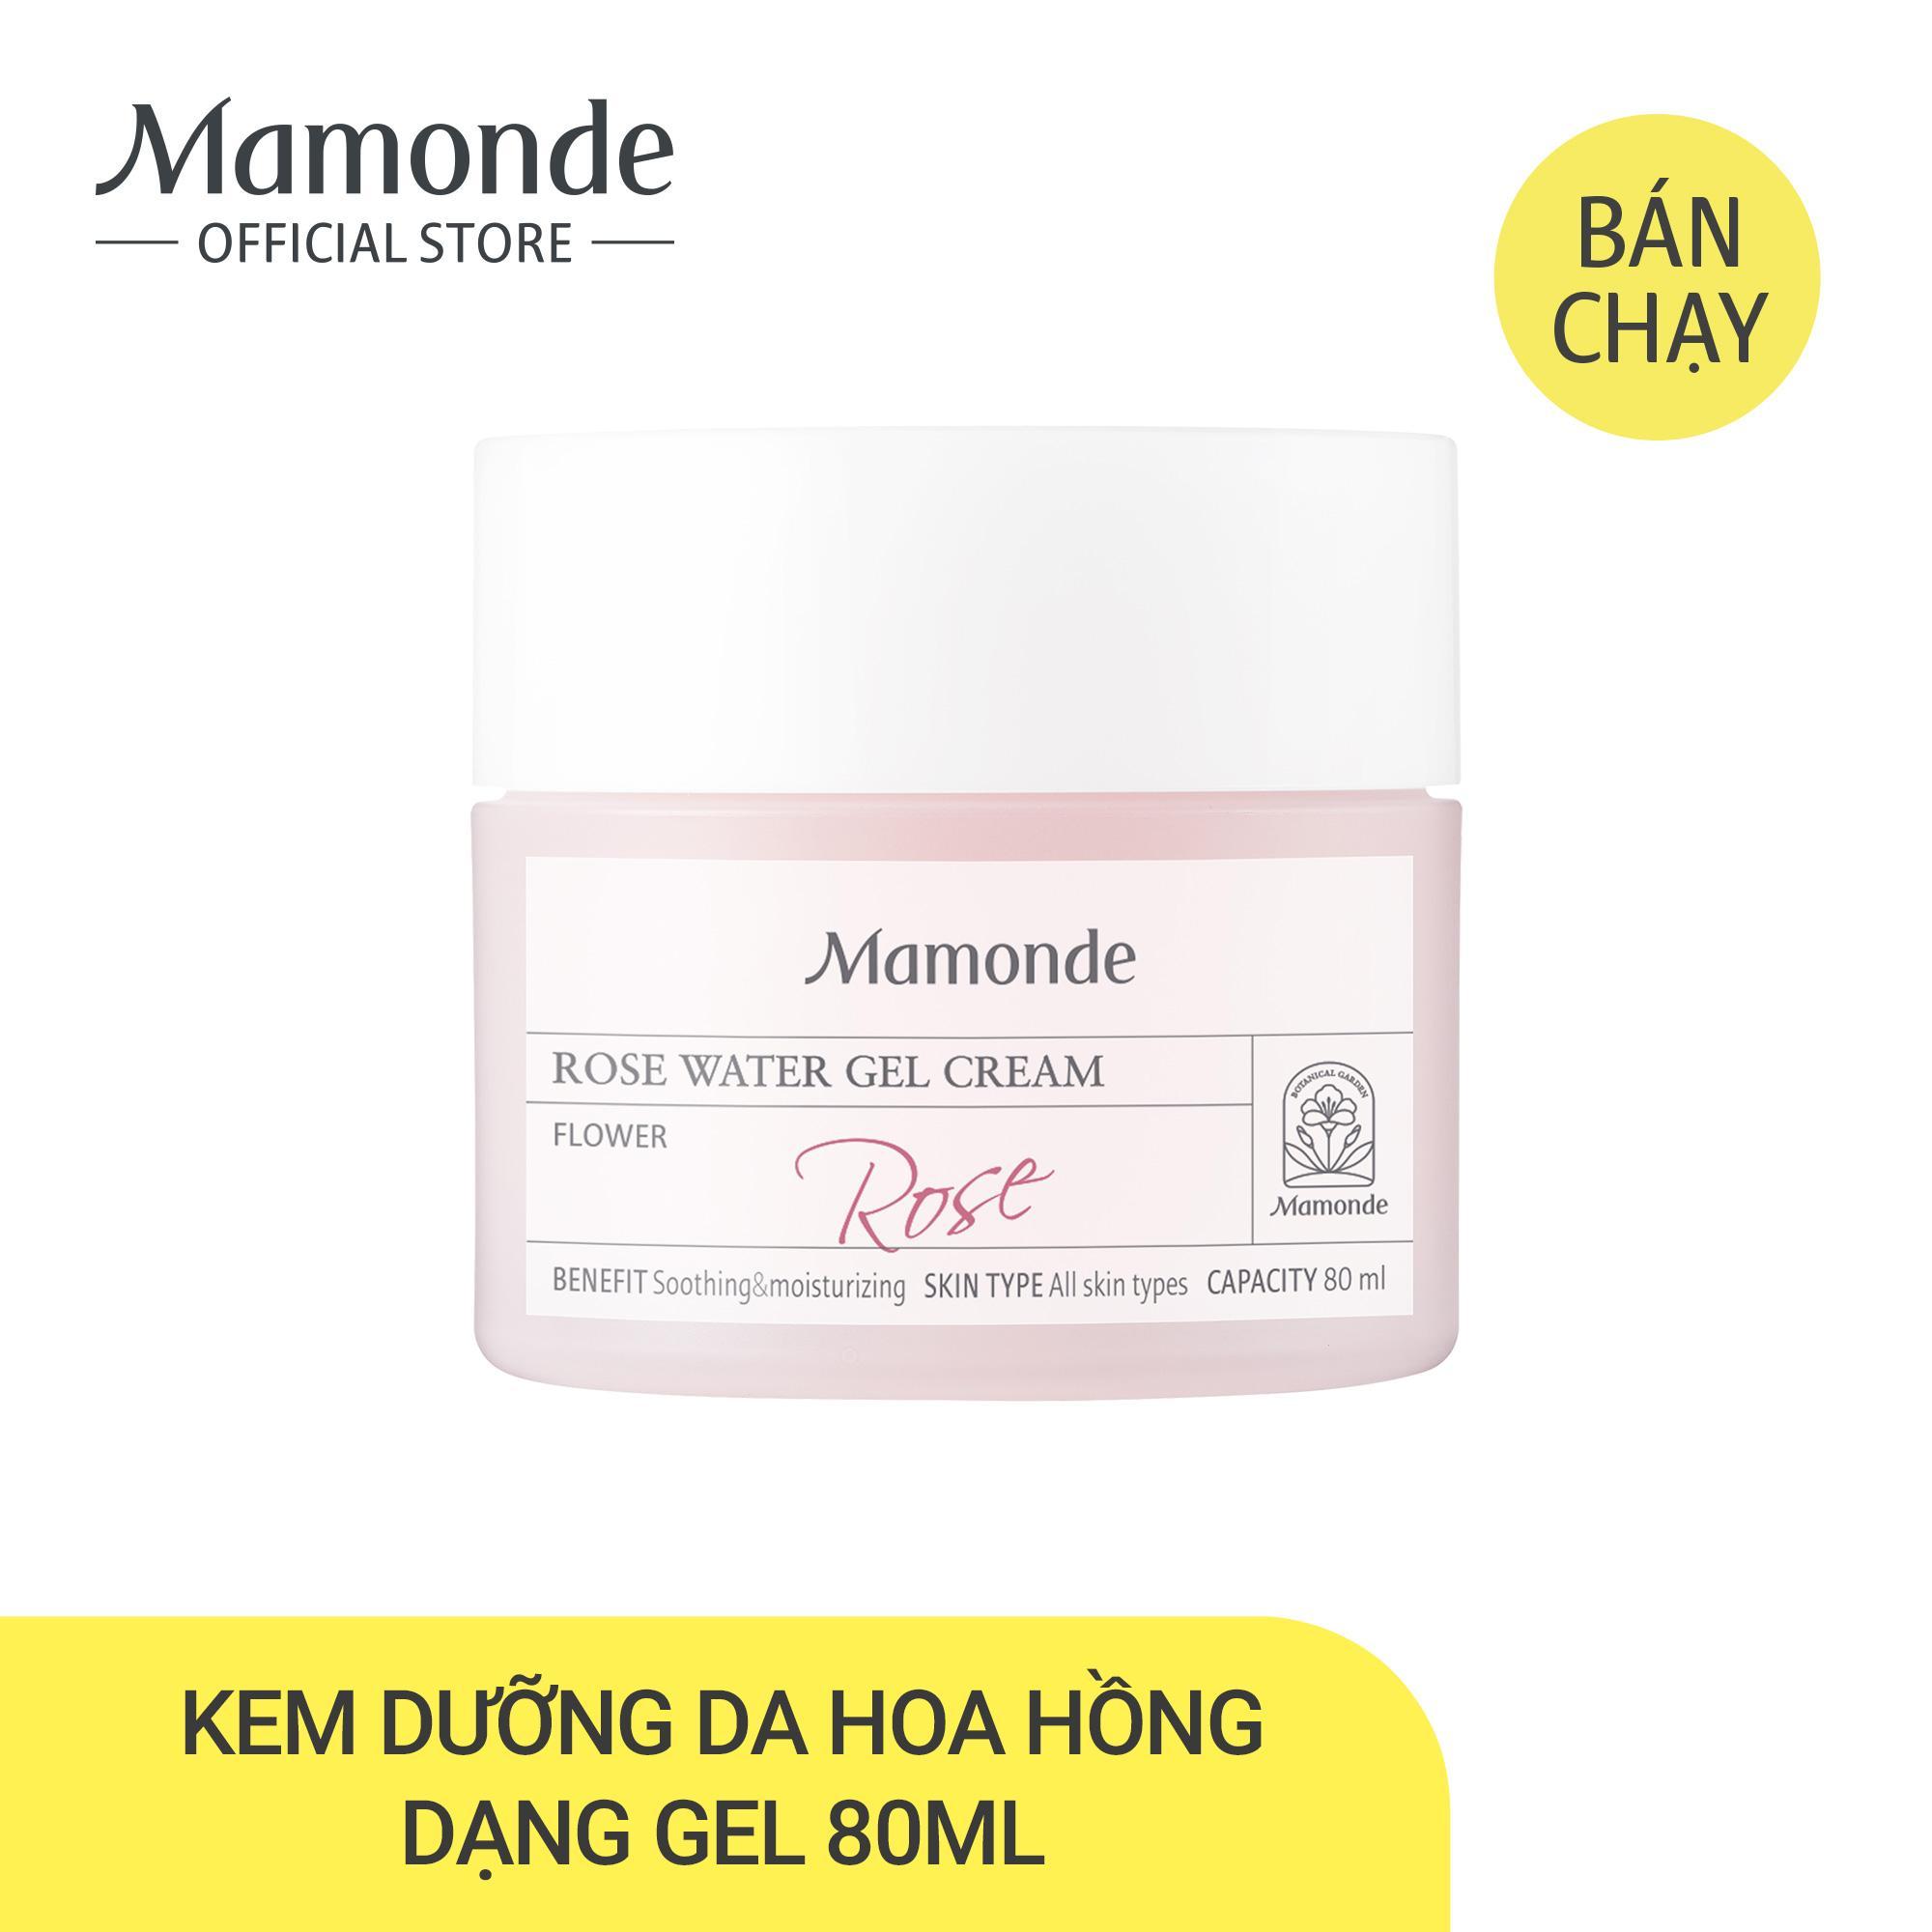 Kem dưỡng ẩm dịu da dạng gel hoa hồng Mamonde Rose Water Gel Cream 80ml